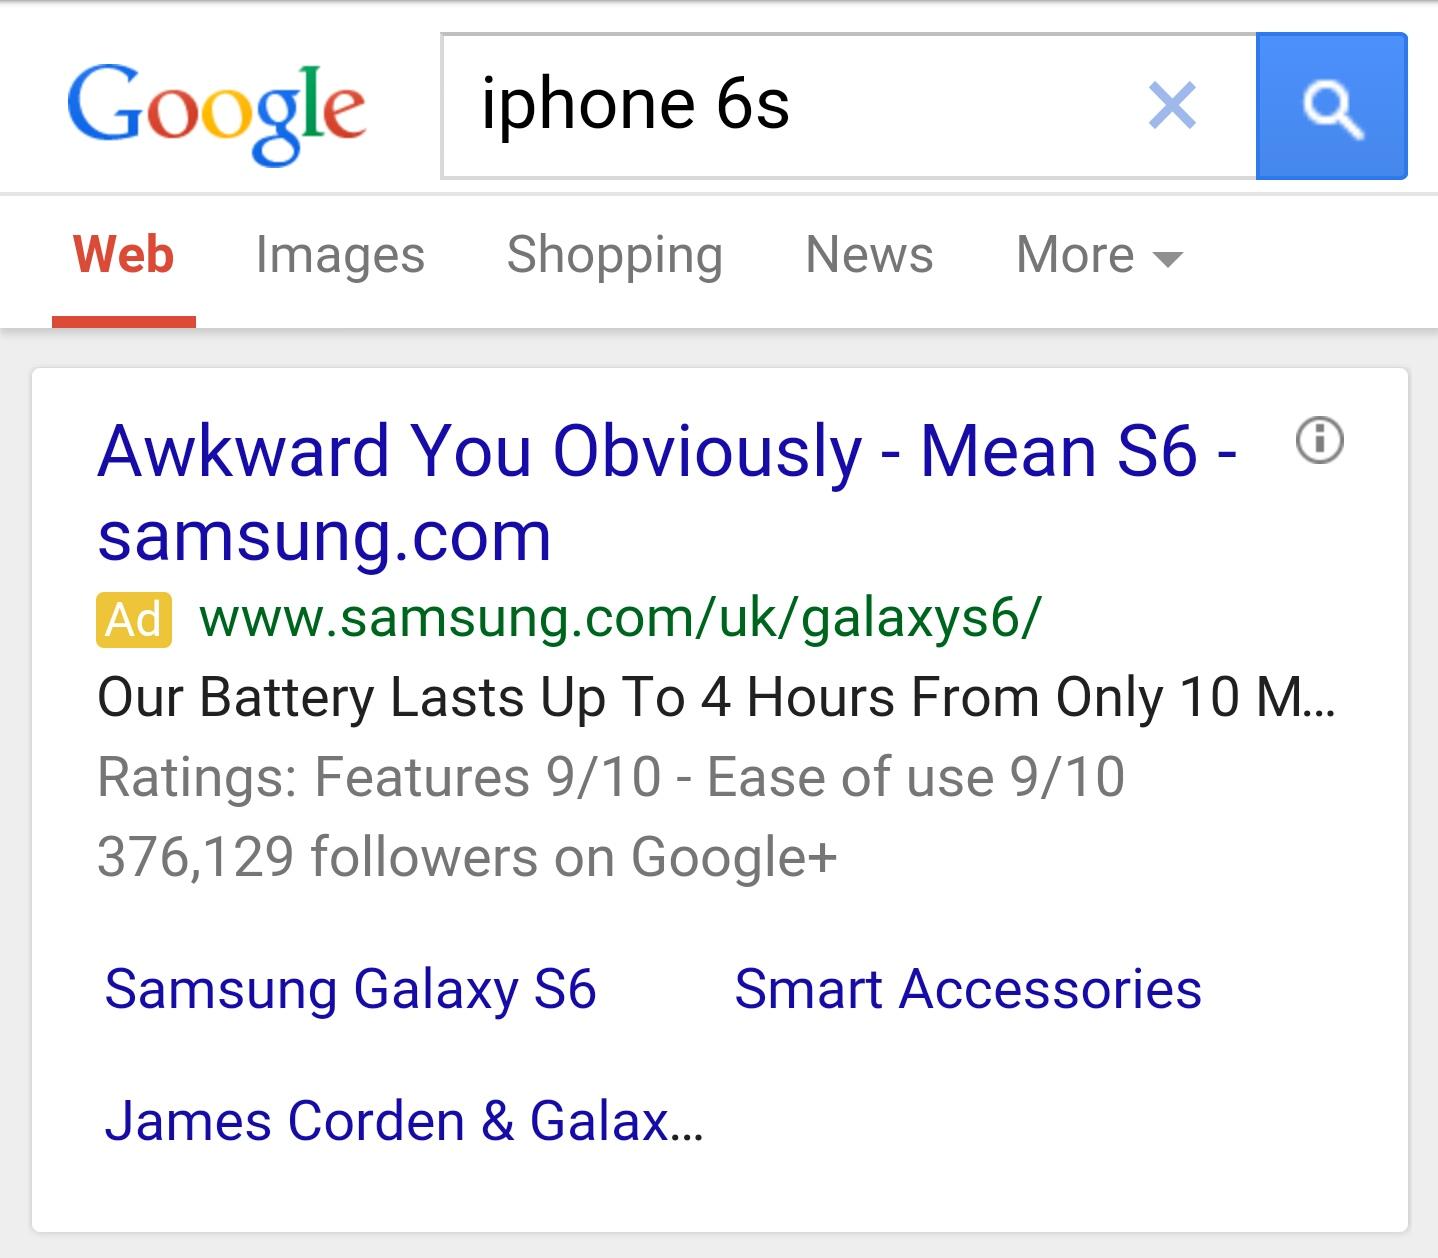 jon reed Samsung S6 iPhone 6s ad